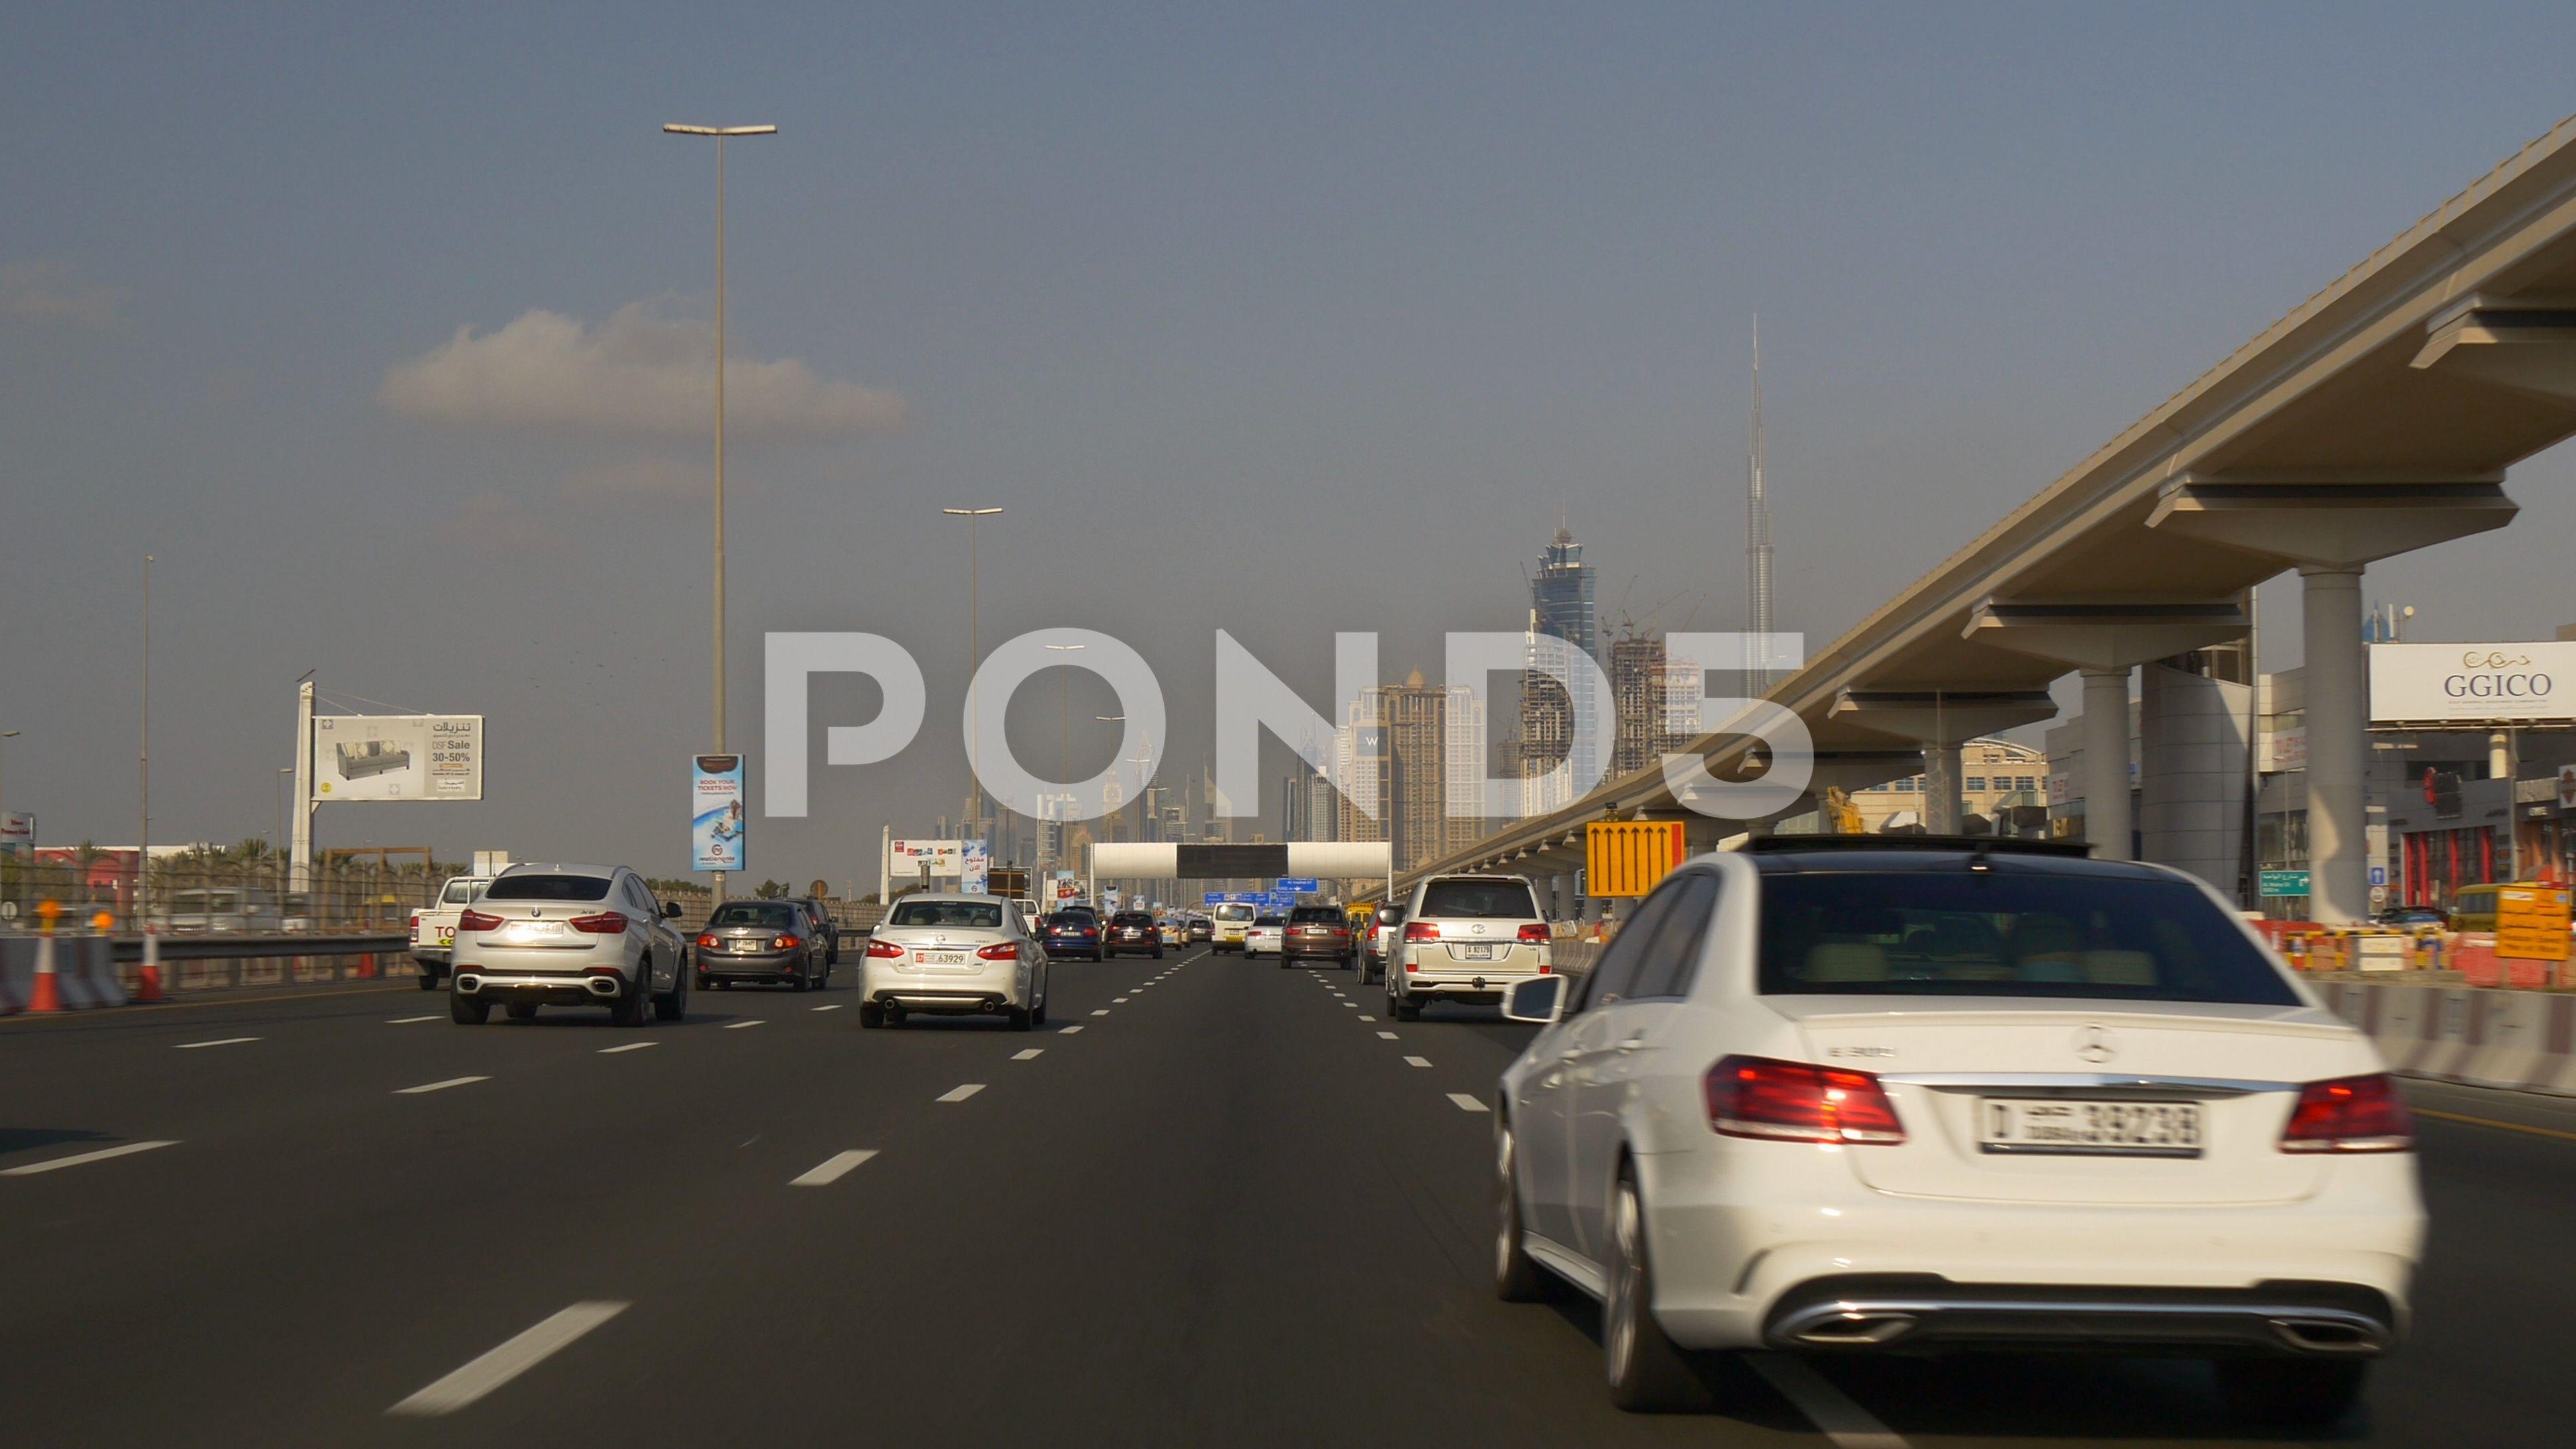 Day Time Sunset Dubai City Main Traffic Pov Car Driving Panorama 4k Uae Stock Footage Ad City Main Traffic Dubai Best Family Cars